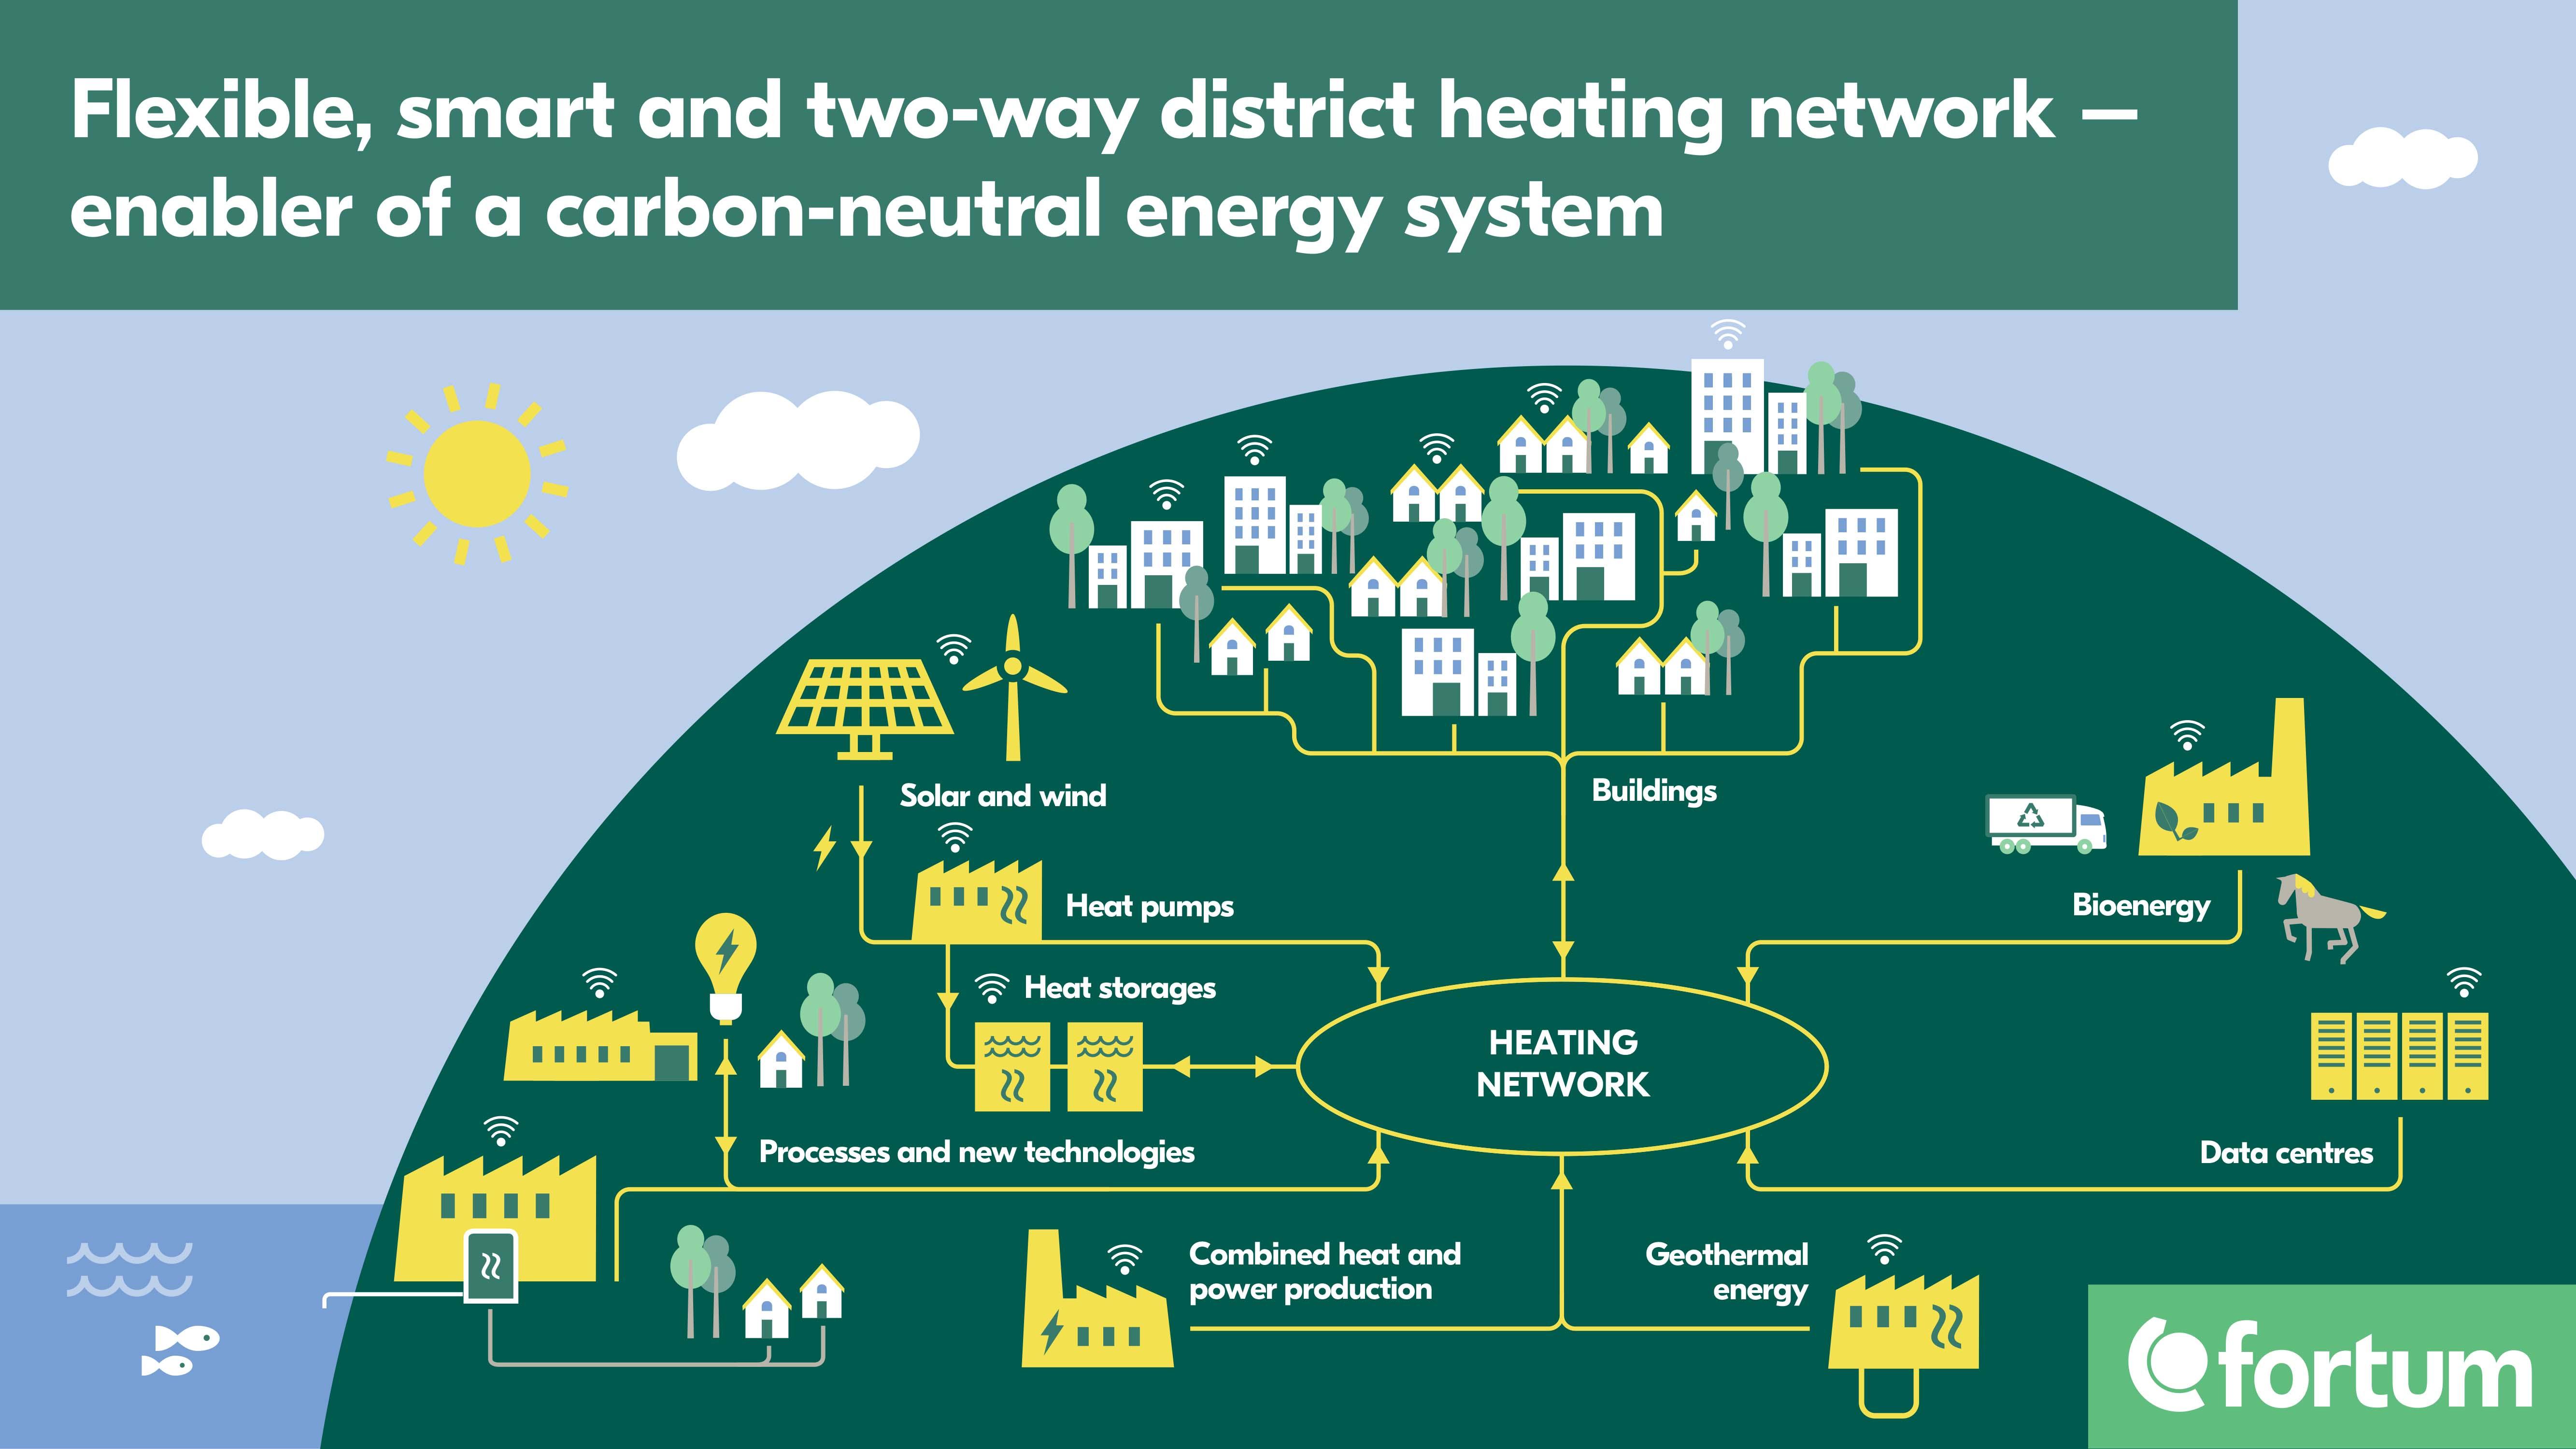 Distric heating network illustration